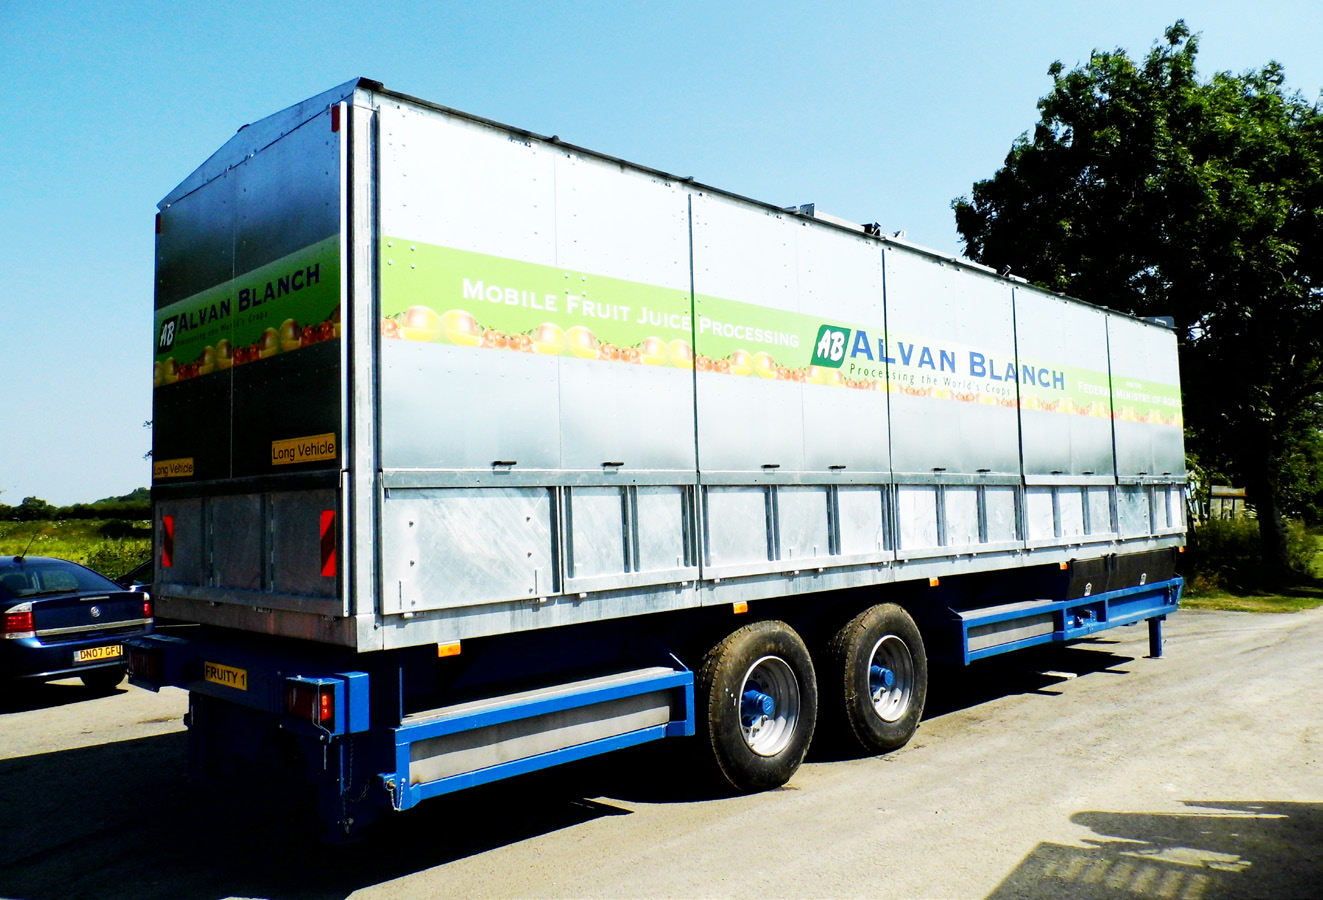 Alvan Blanch Mobile Fruit Juice Processing System Nigeria Page 1 Image 0003